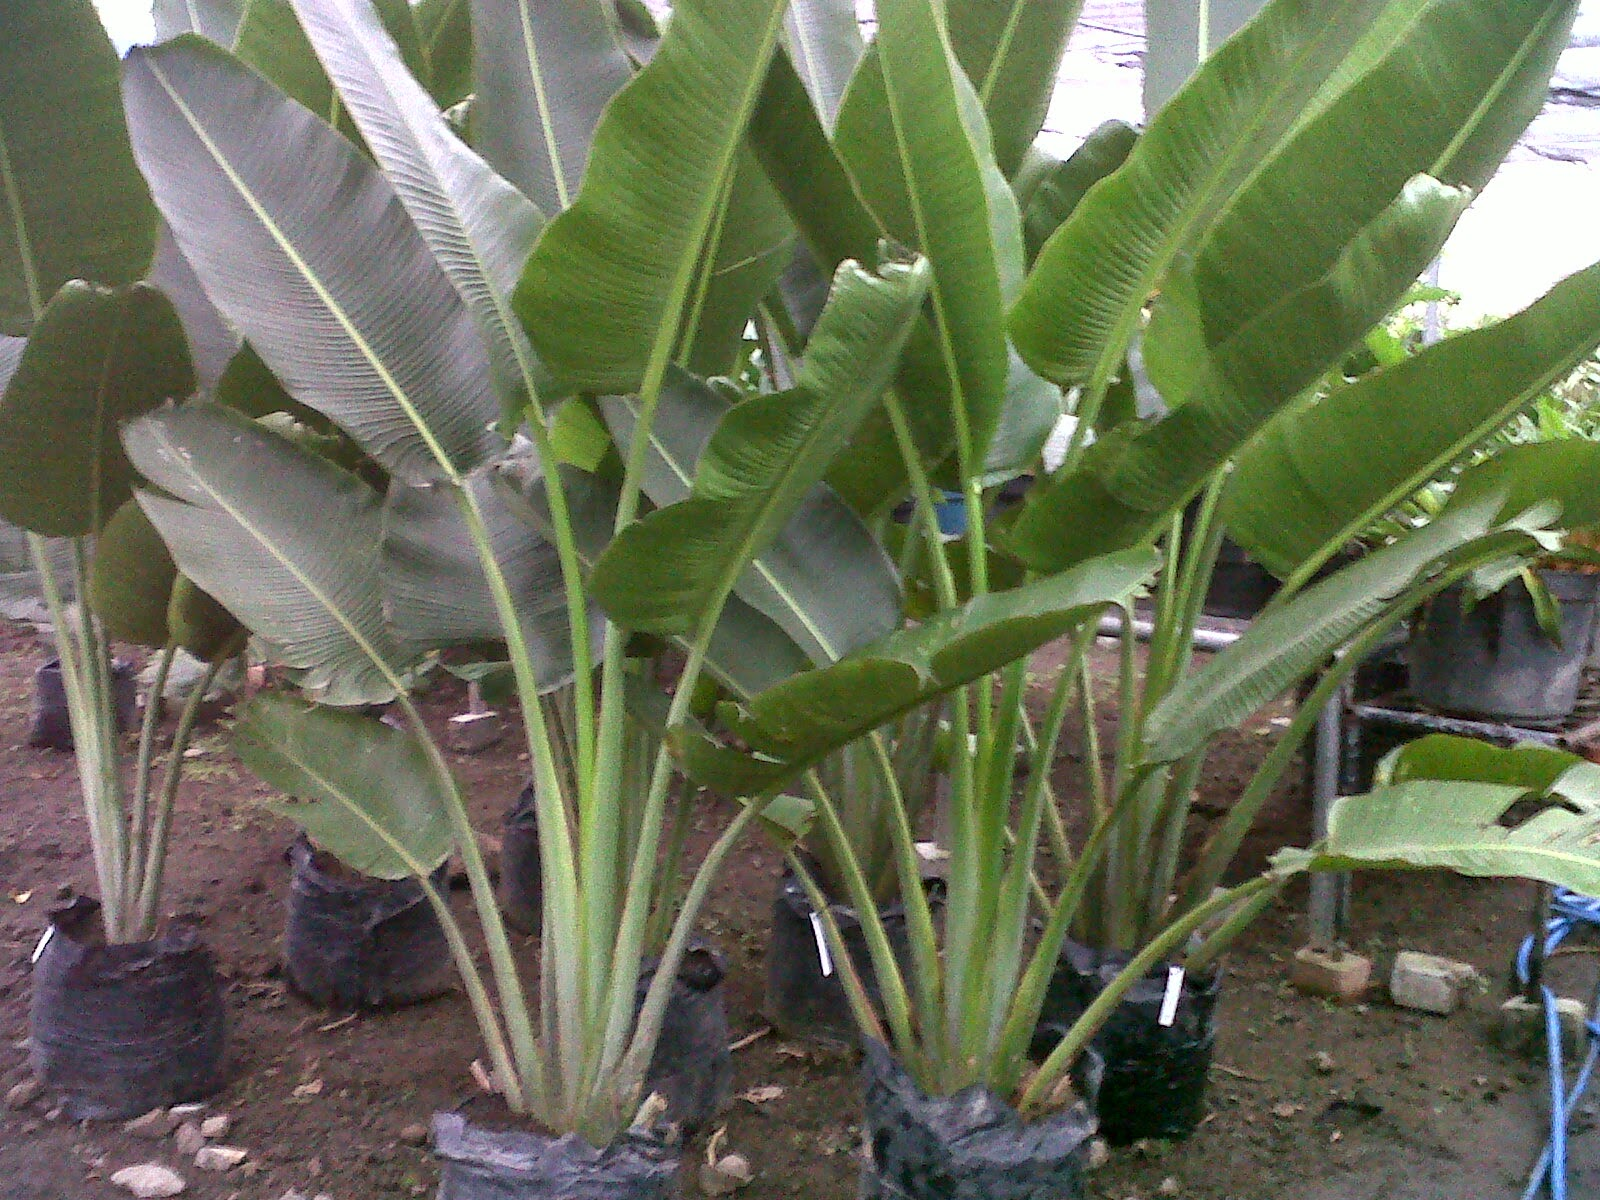 Jual pohon pisang kipas | (Revenala madagascariensis) | (Traveller's Palm) | suplier tanaman | tanaman hias | jasa deain taman